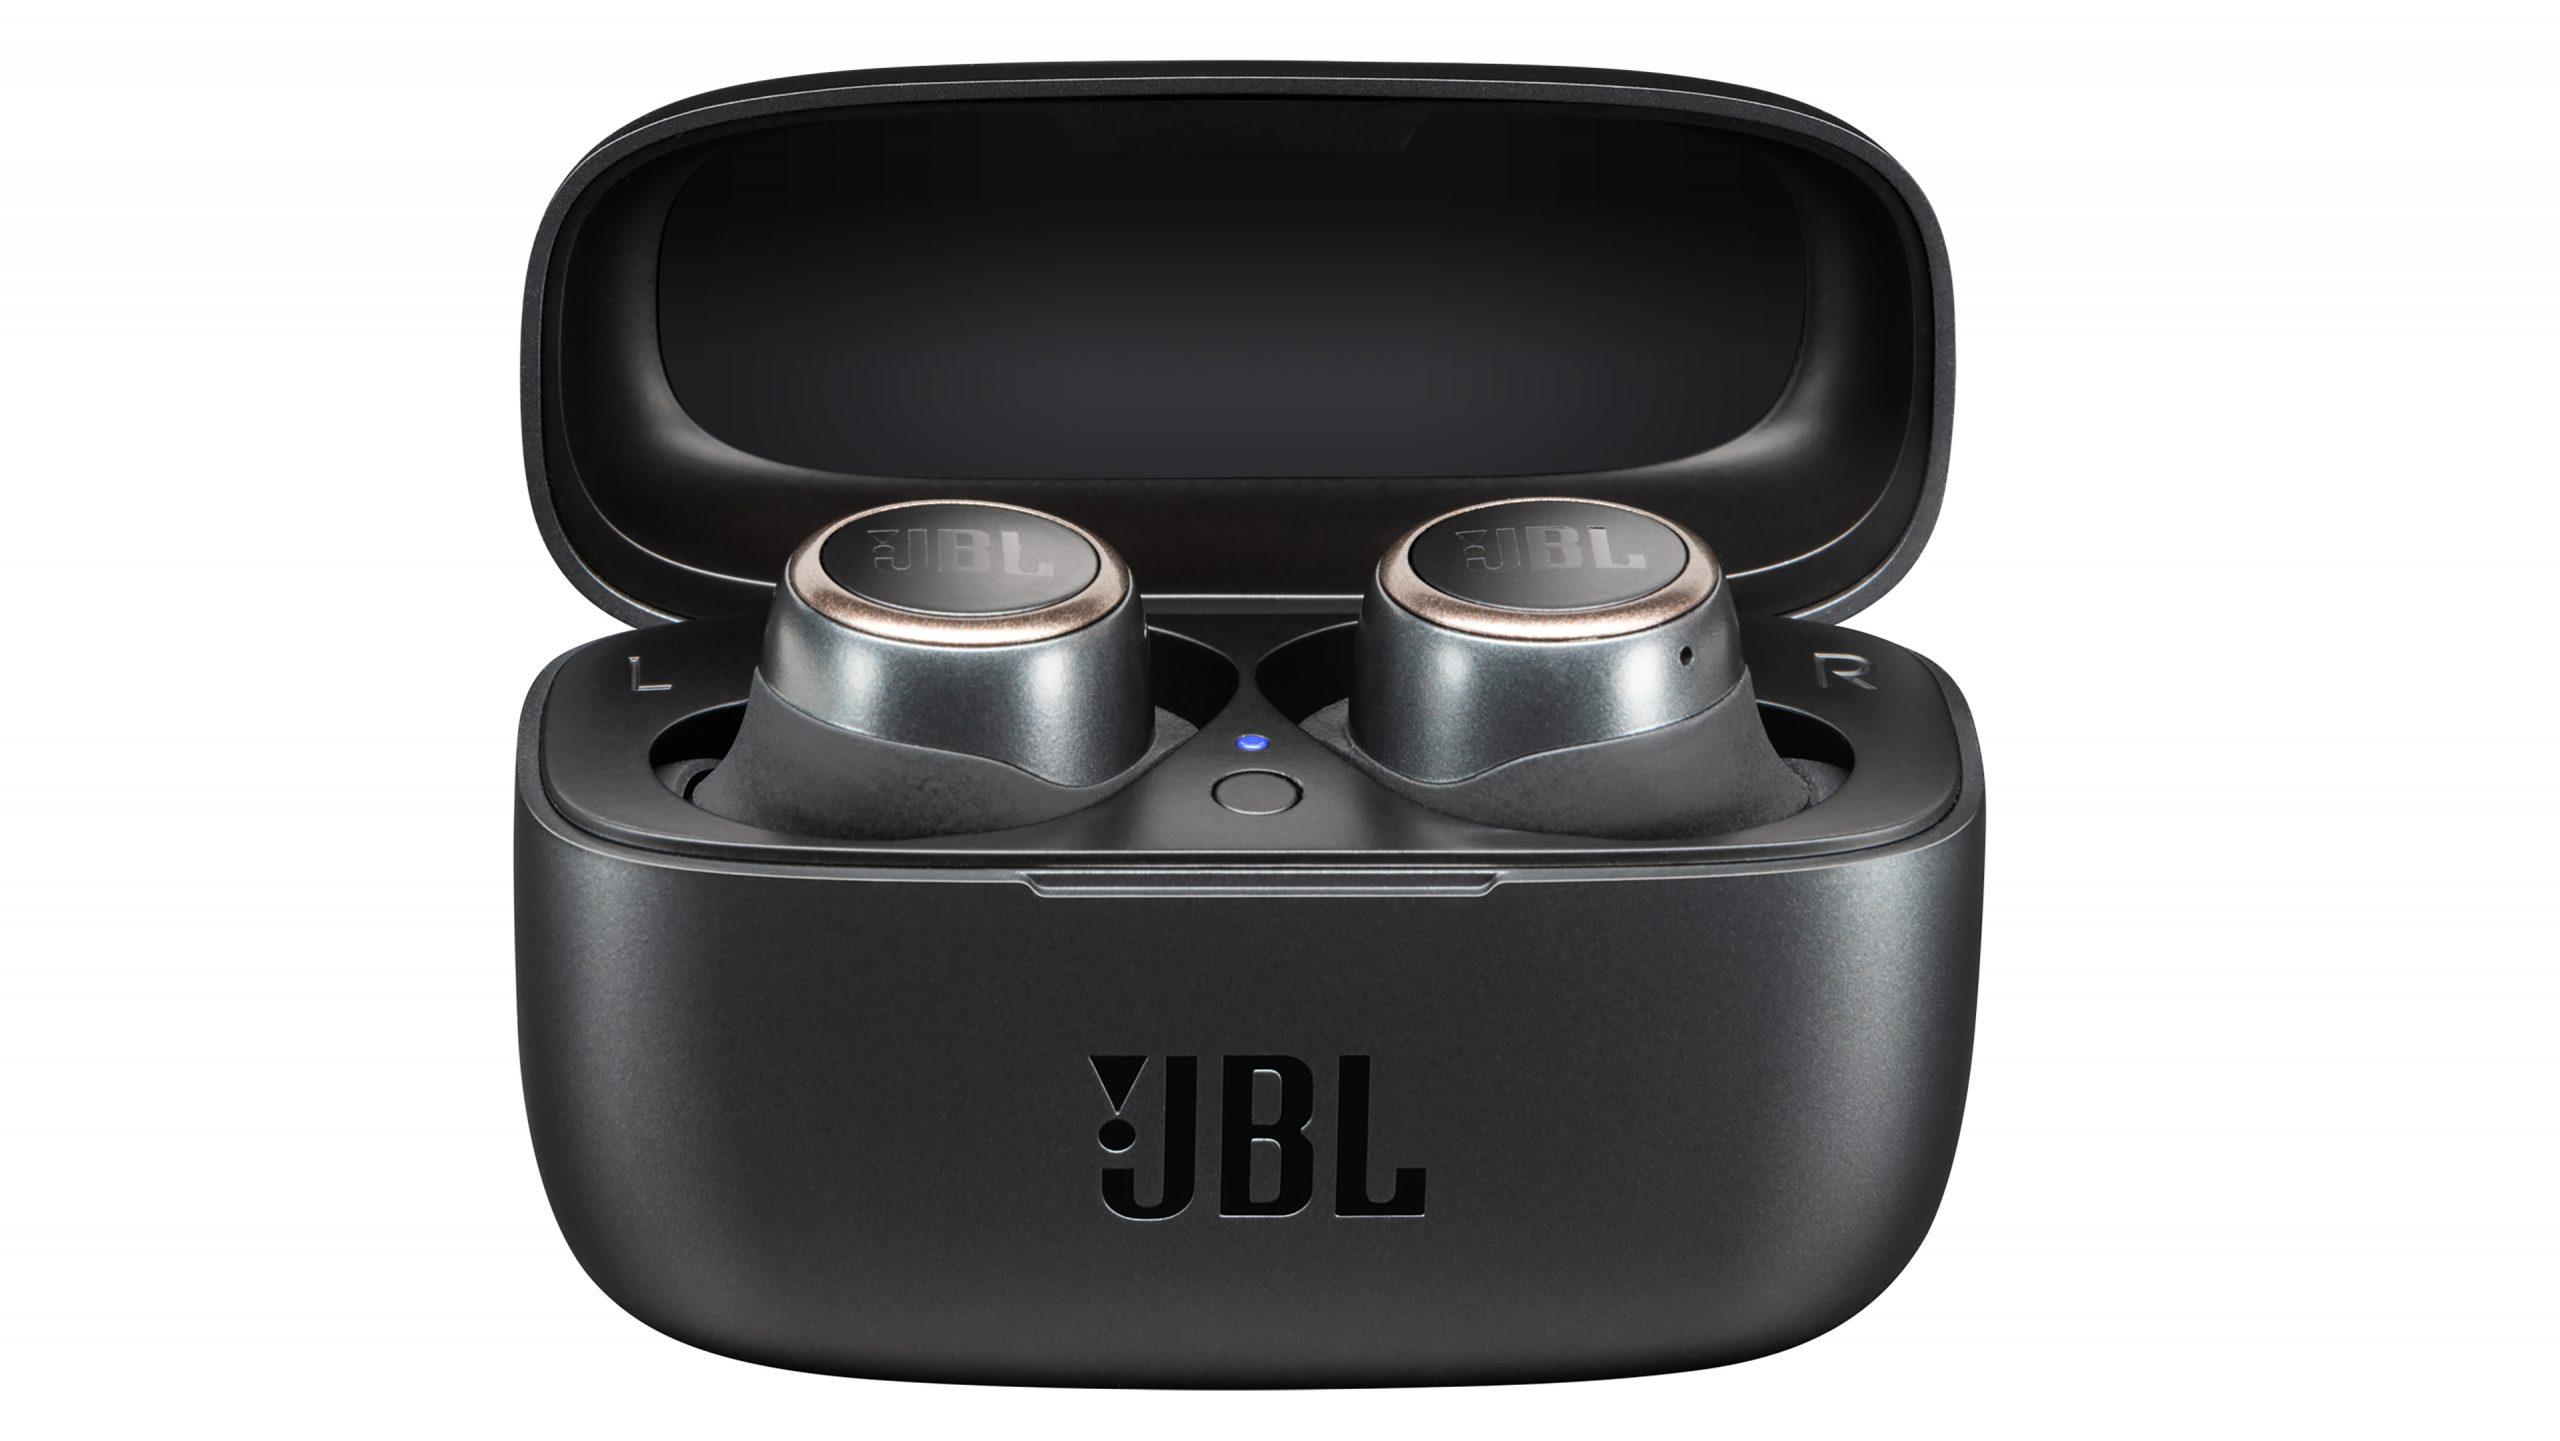 JBL LIVE300TWS Product Image Black Case 01 scaled 1 - JBL Live 300TWS